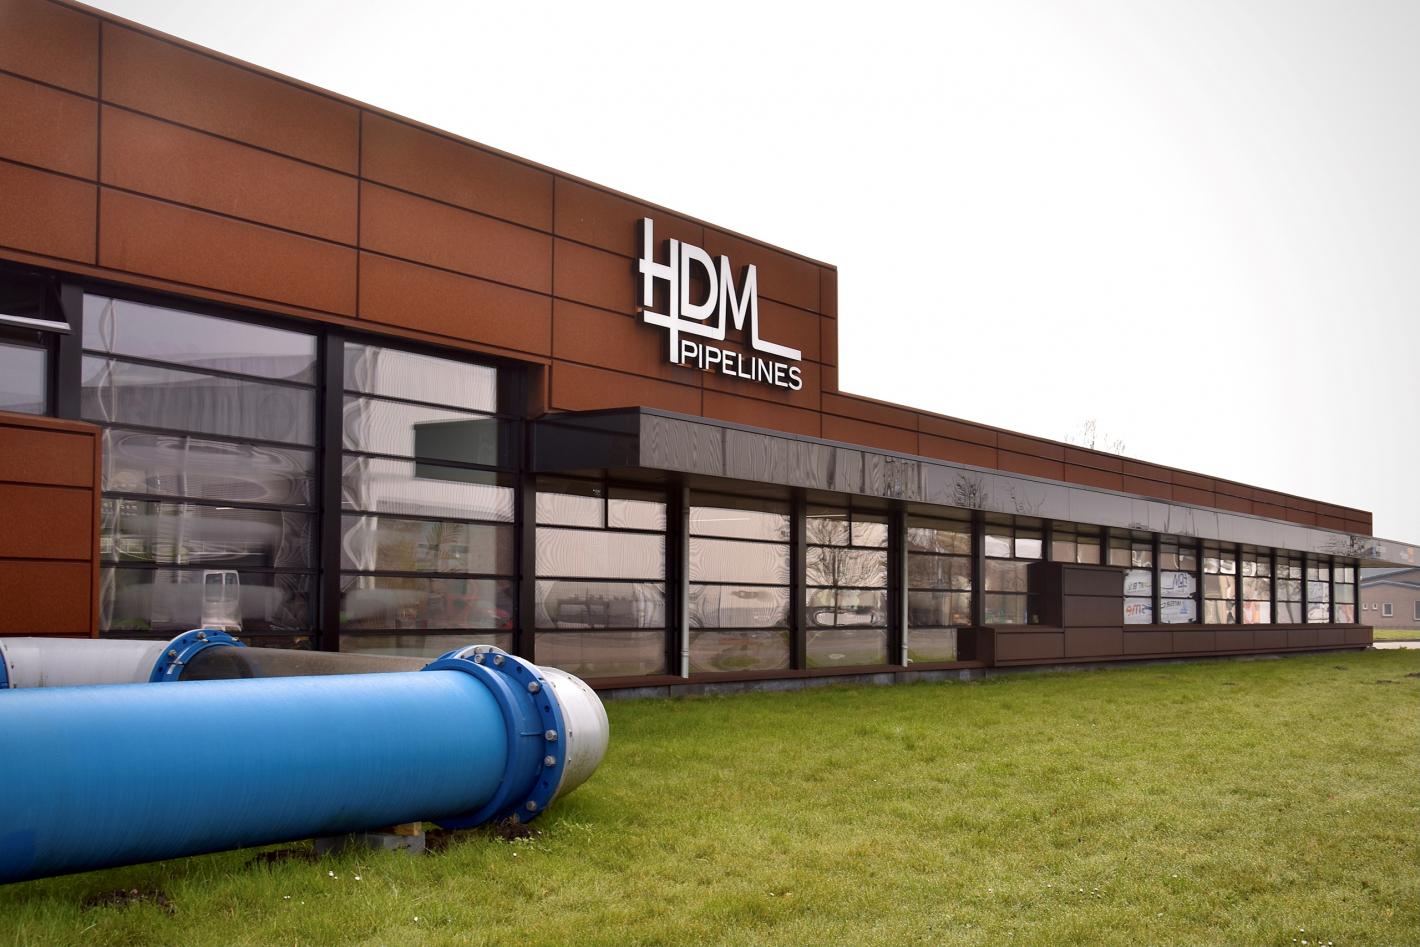 hdm pipelines pand leeuwarden